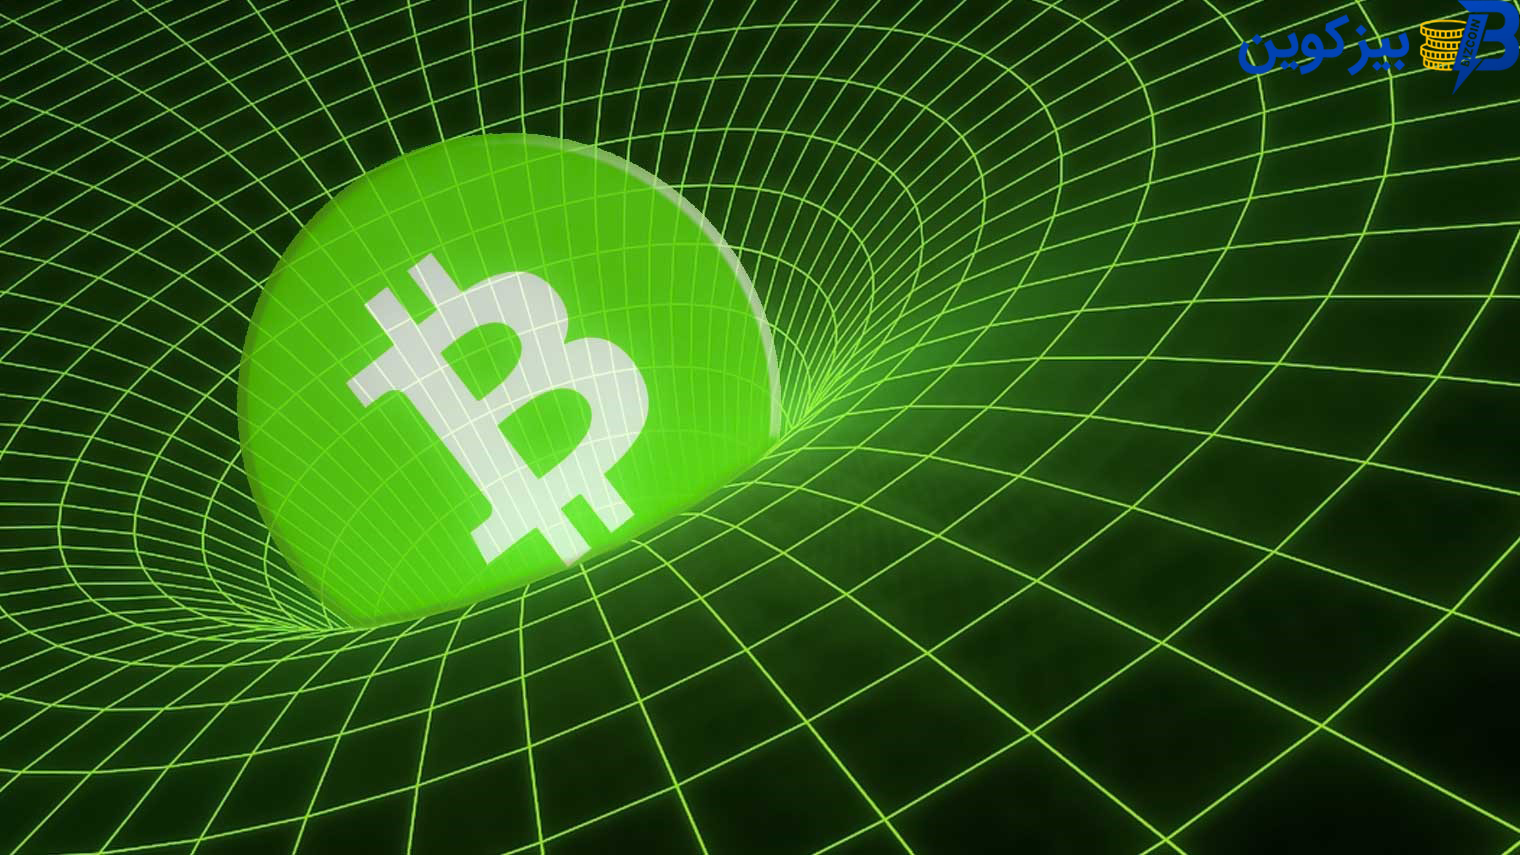 pre sale bitcoin 2 آیا پیش فروش بیت کوین یک دروغ بزرگ است؟